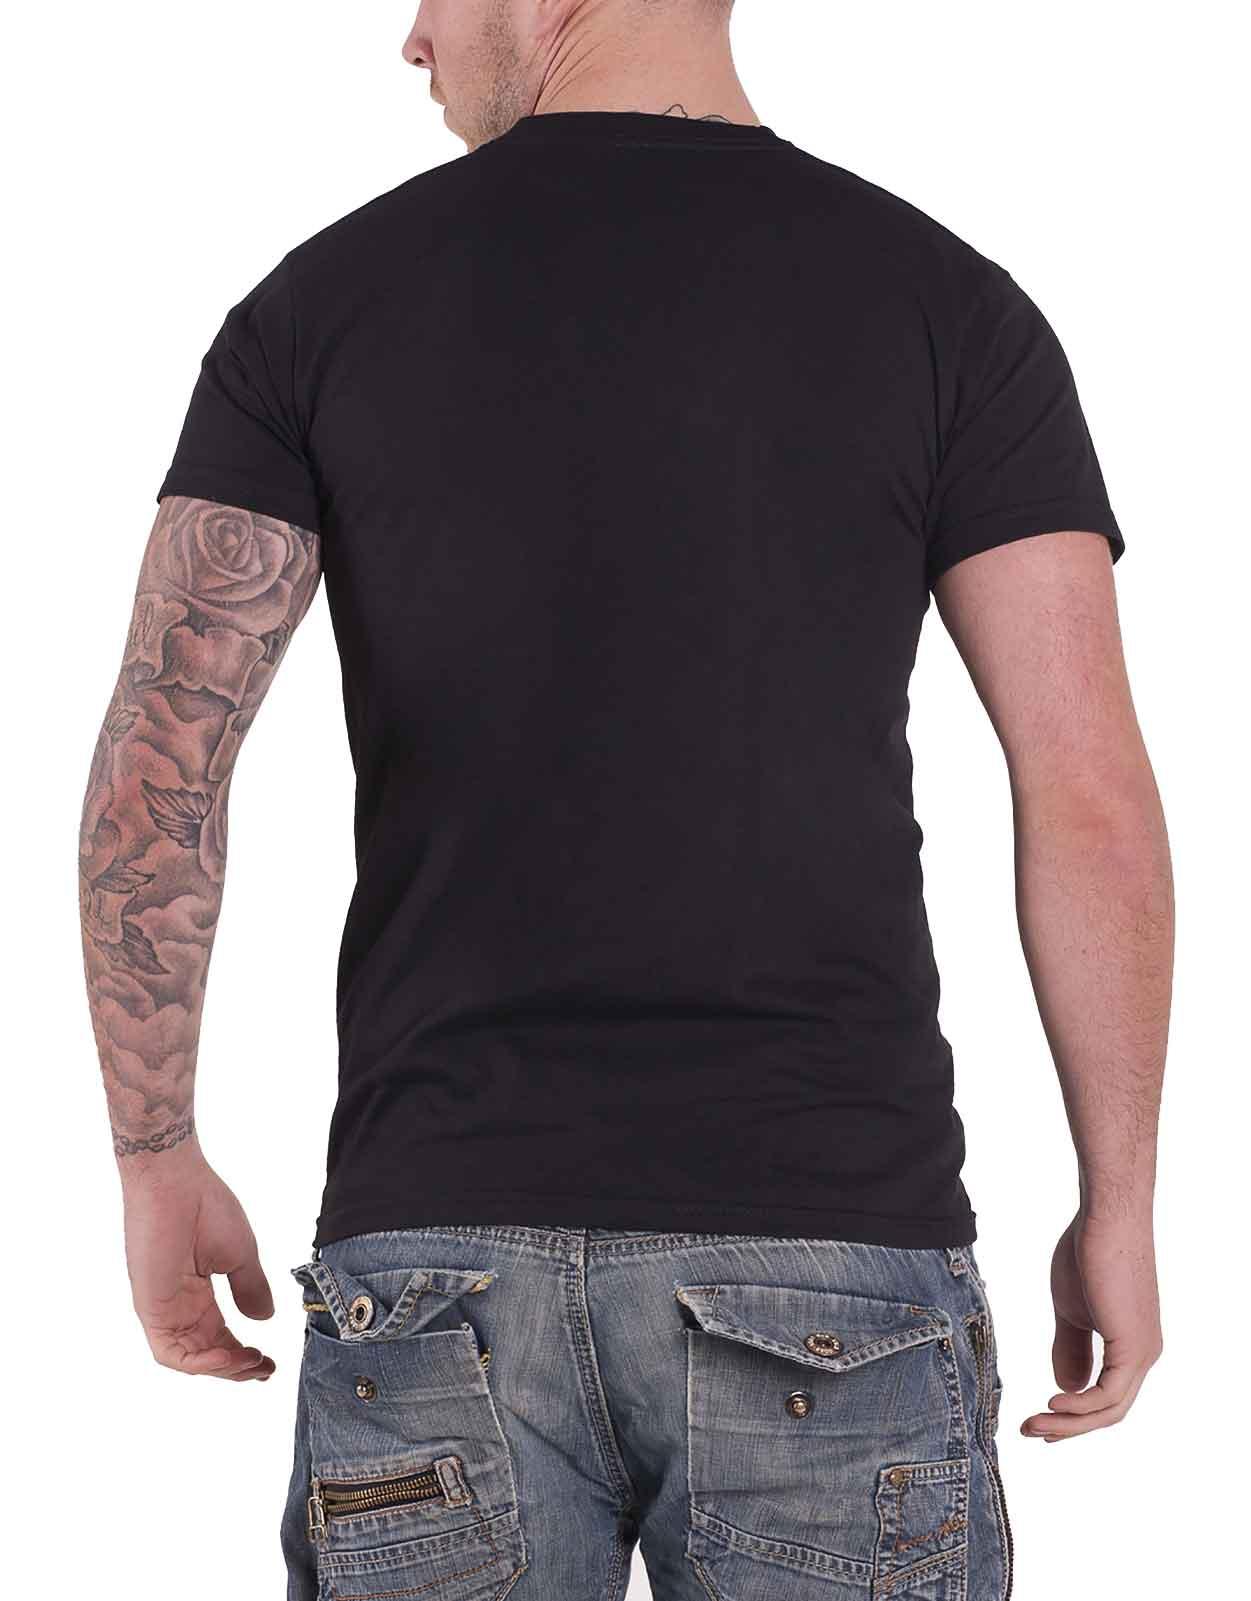 Official-Motley-Crue-T-Shirt-Shout-at-the-Devil-The-Dirt-Tour-Band-Logo-Mens thumbnail 25